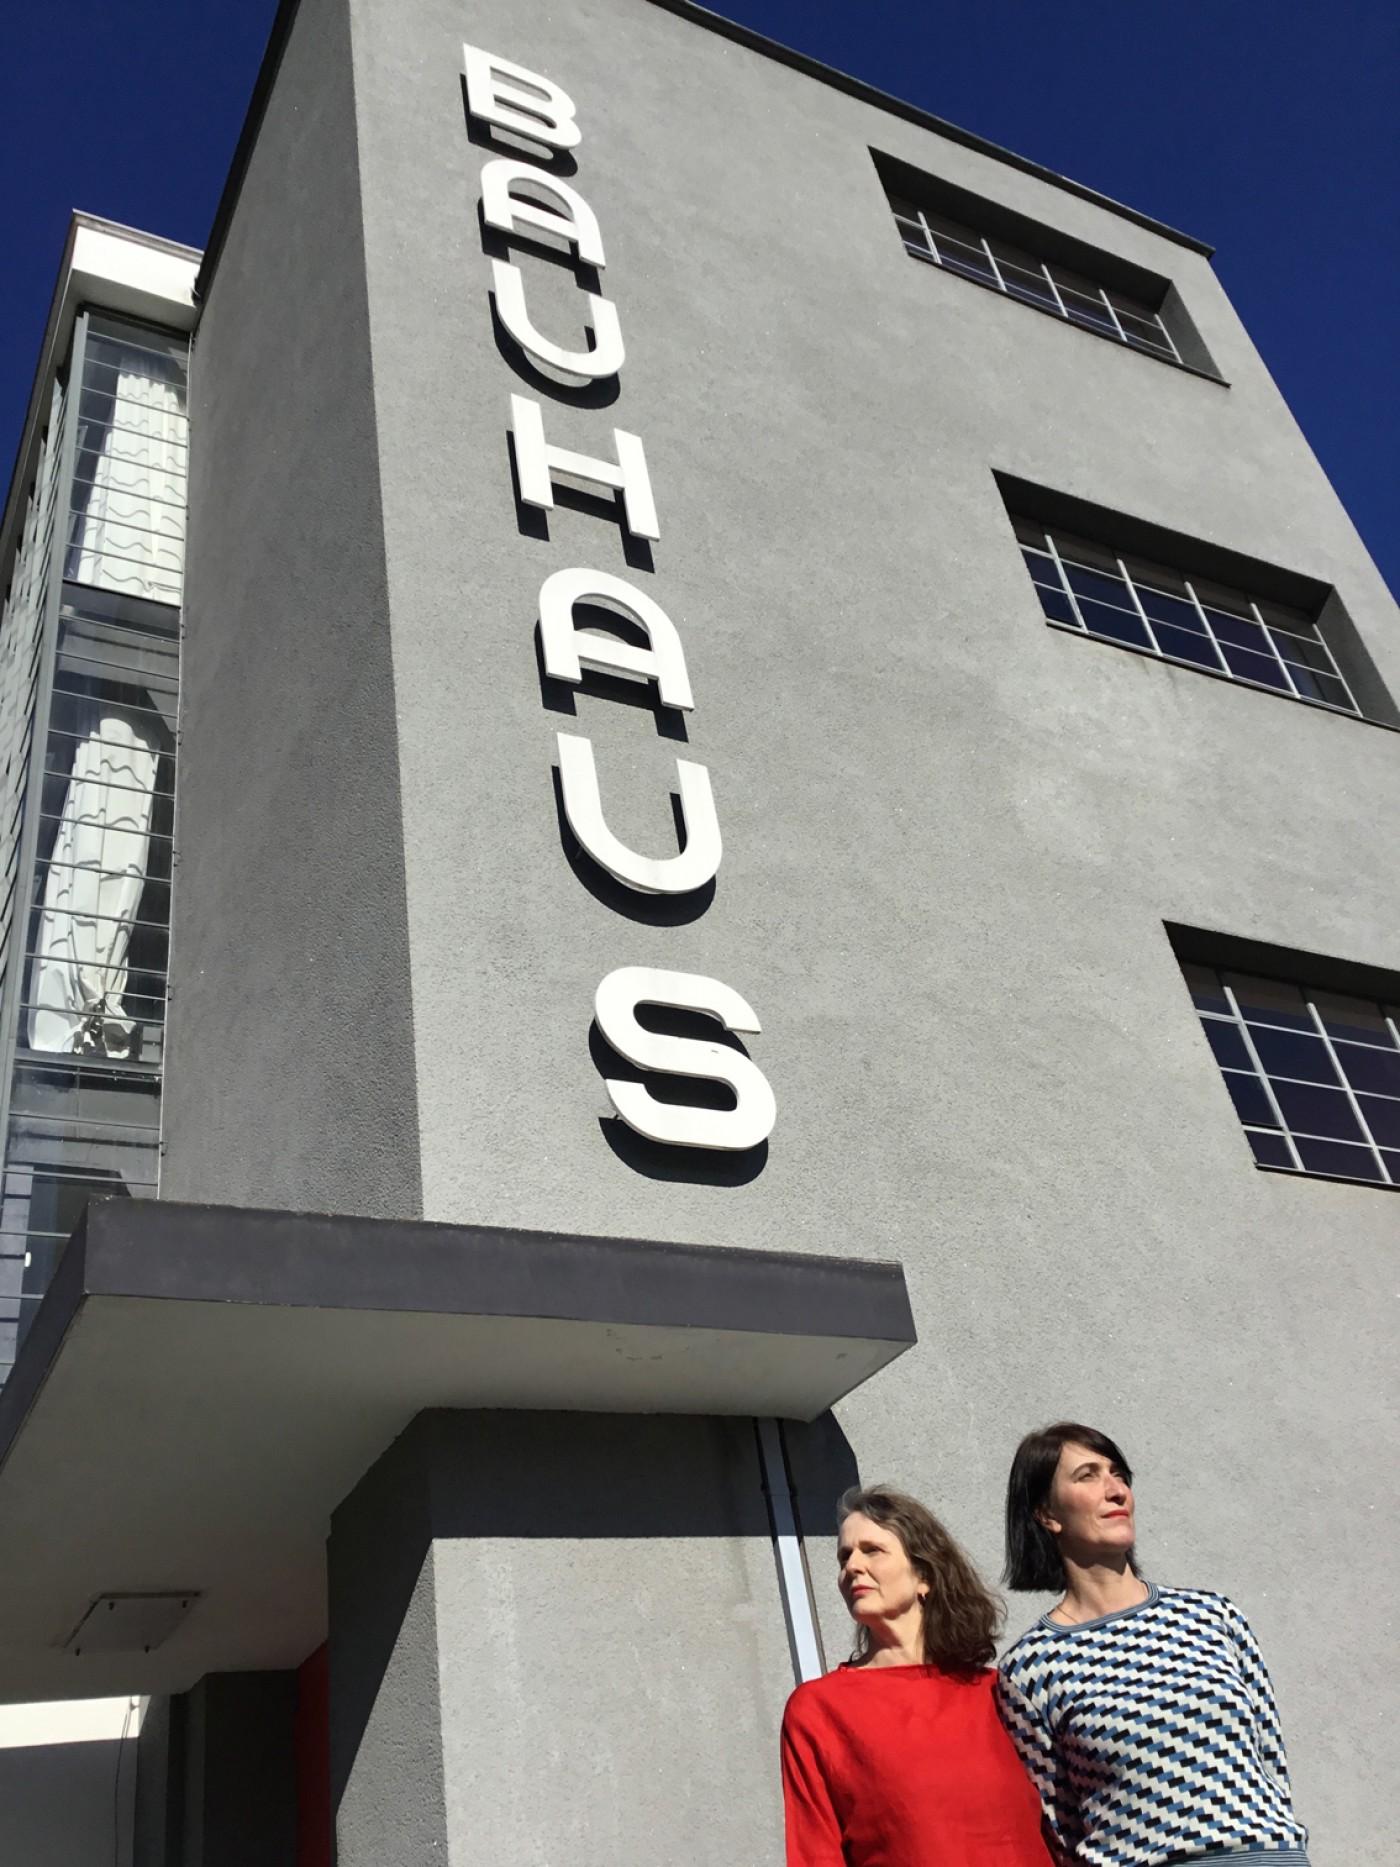 Bauhaus small